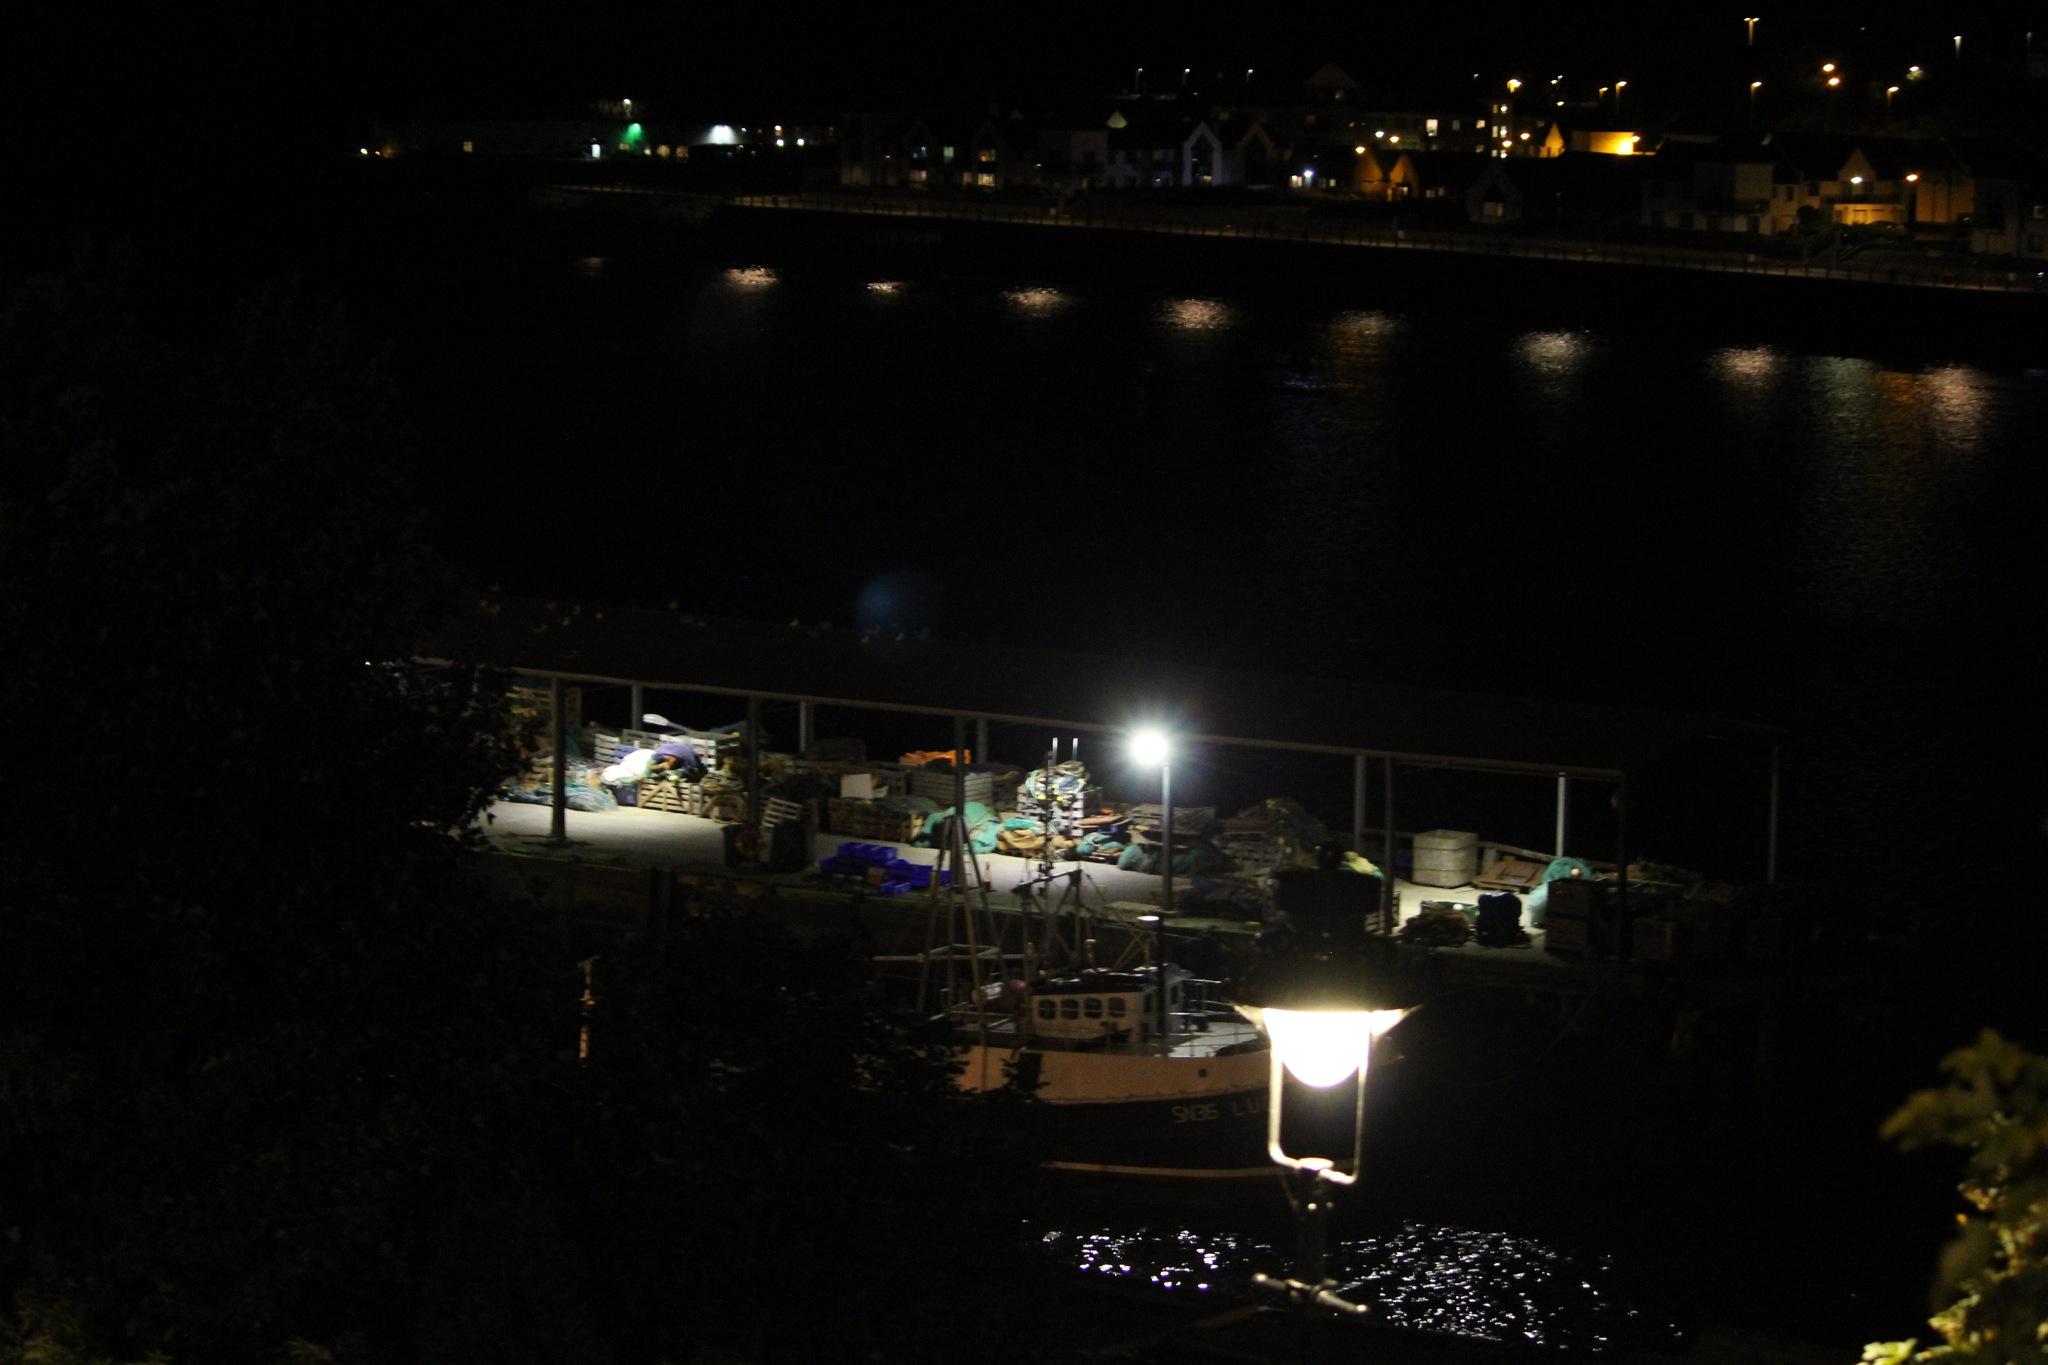 Fishing Boat at night by Craig Neve